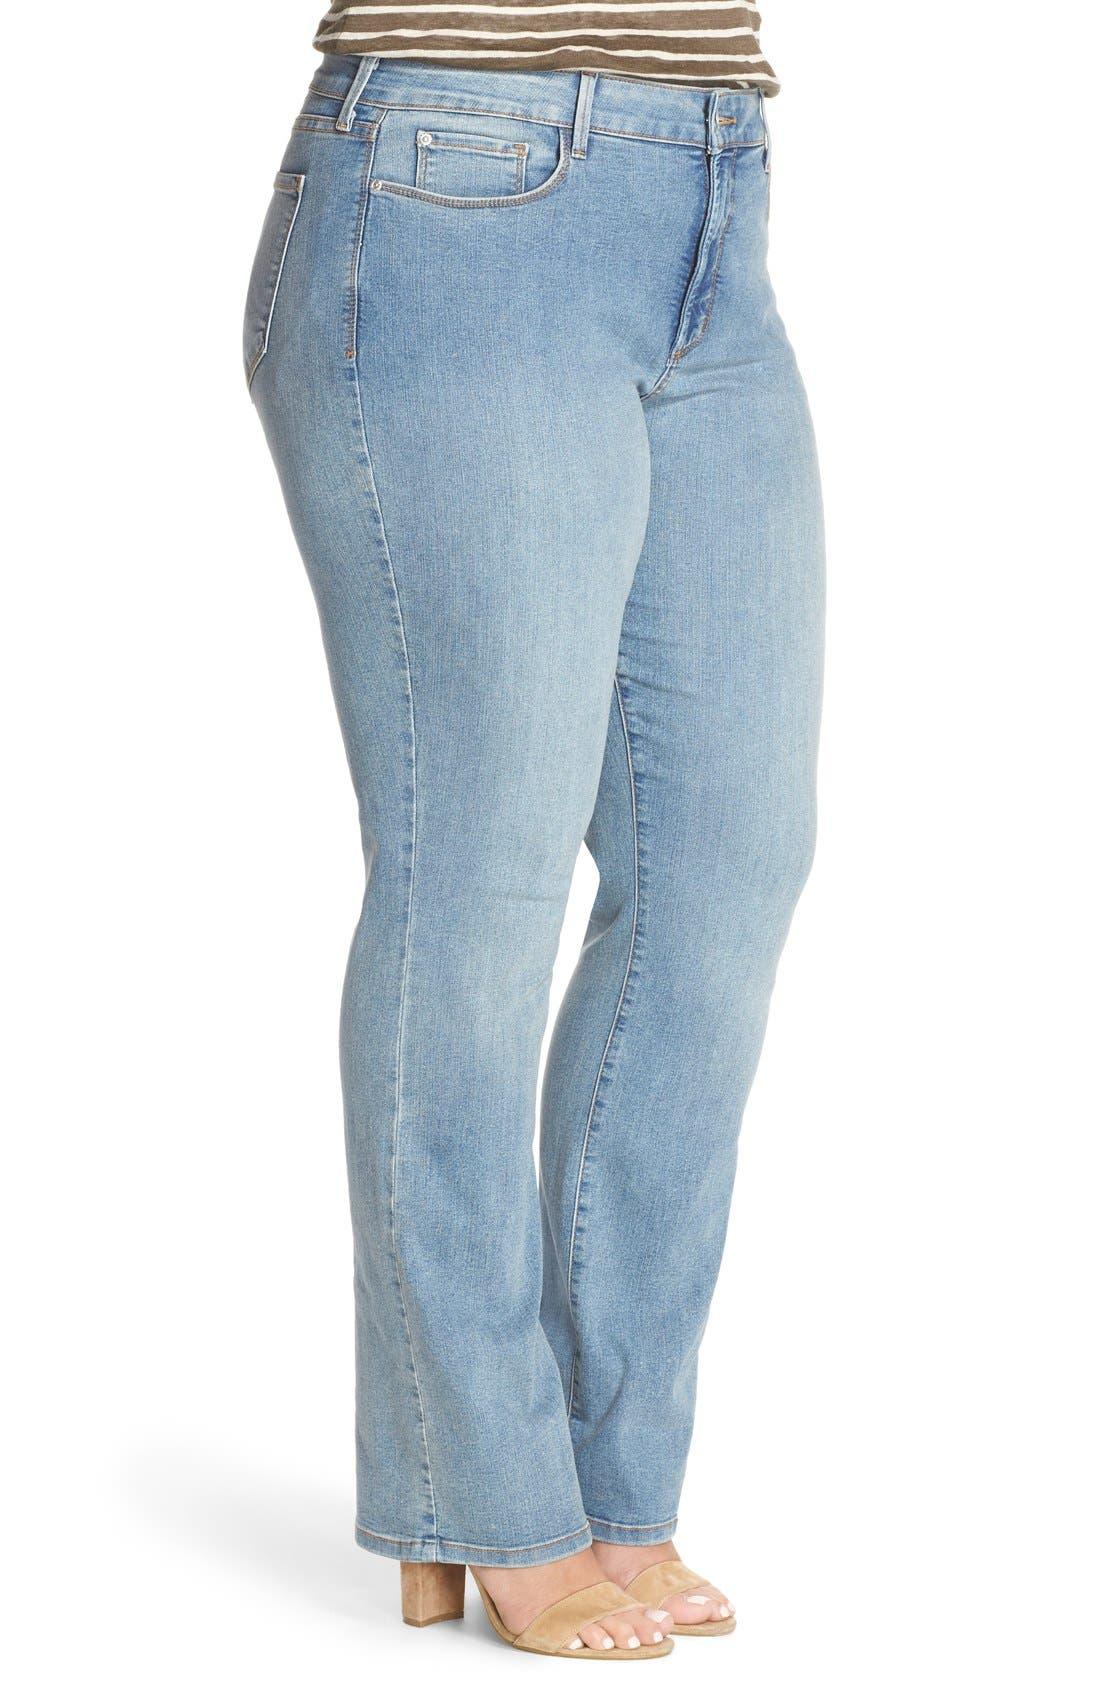 Alternate Image 3  - NYDJ 'Billie' Stretch Mini Bootcut Jeans (Plus Size)